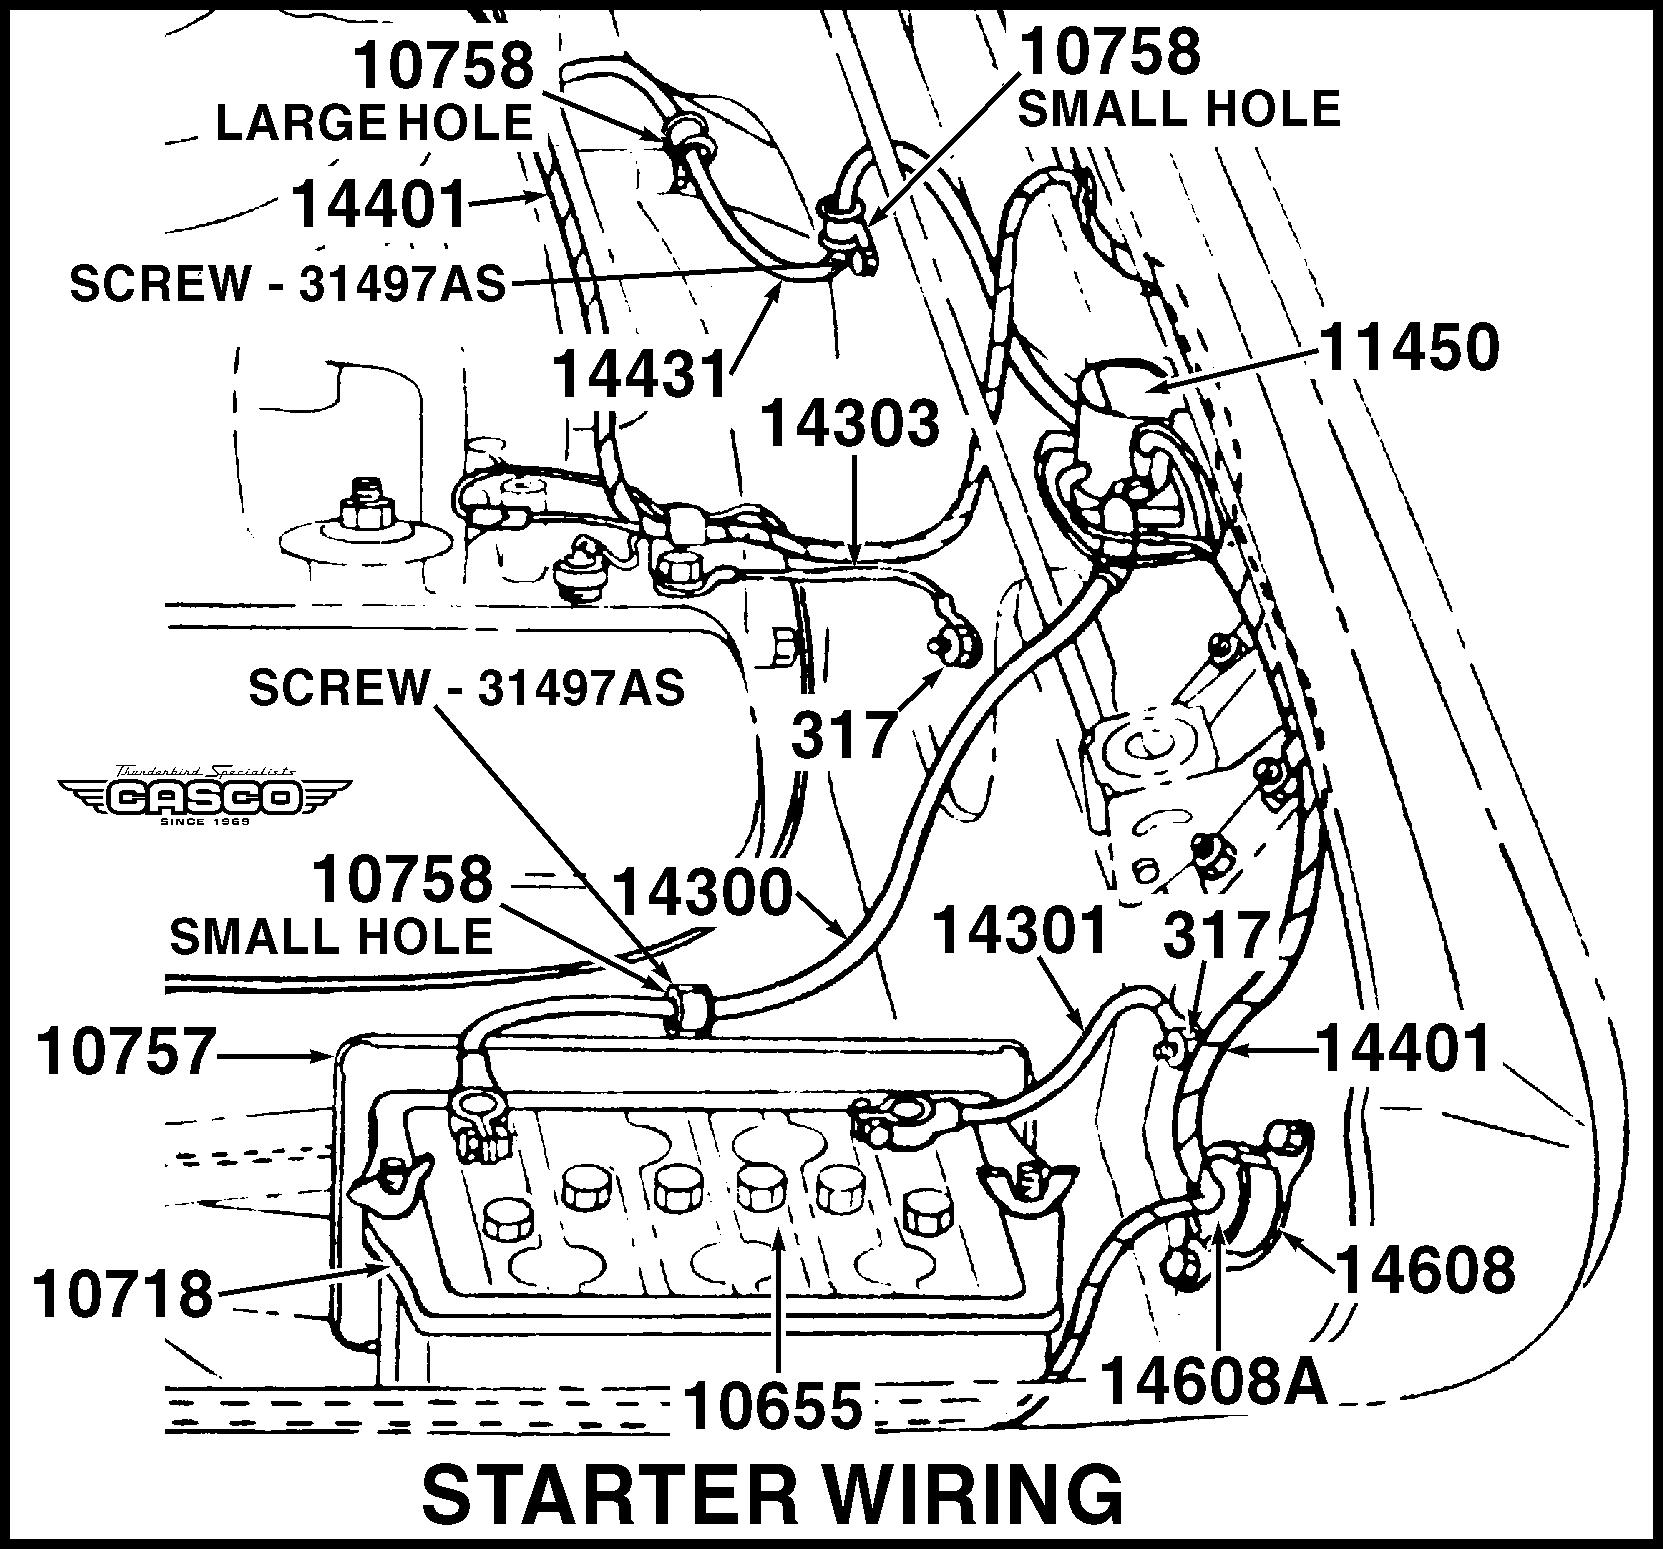 retainer - cowl main wiring grommet